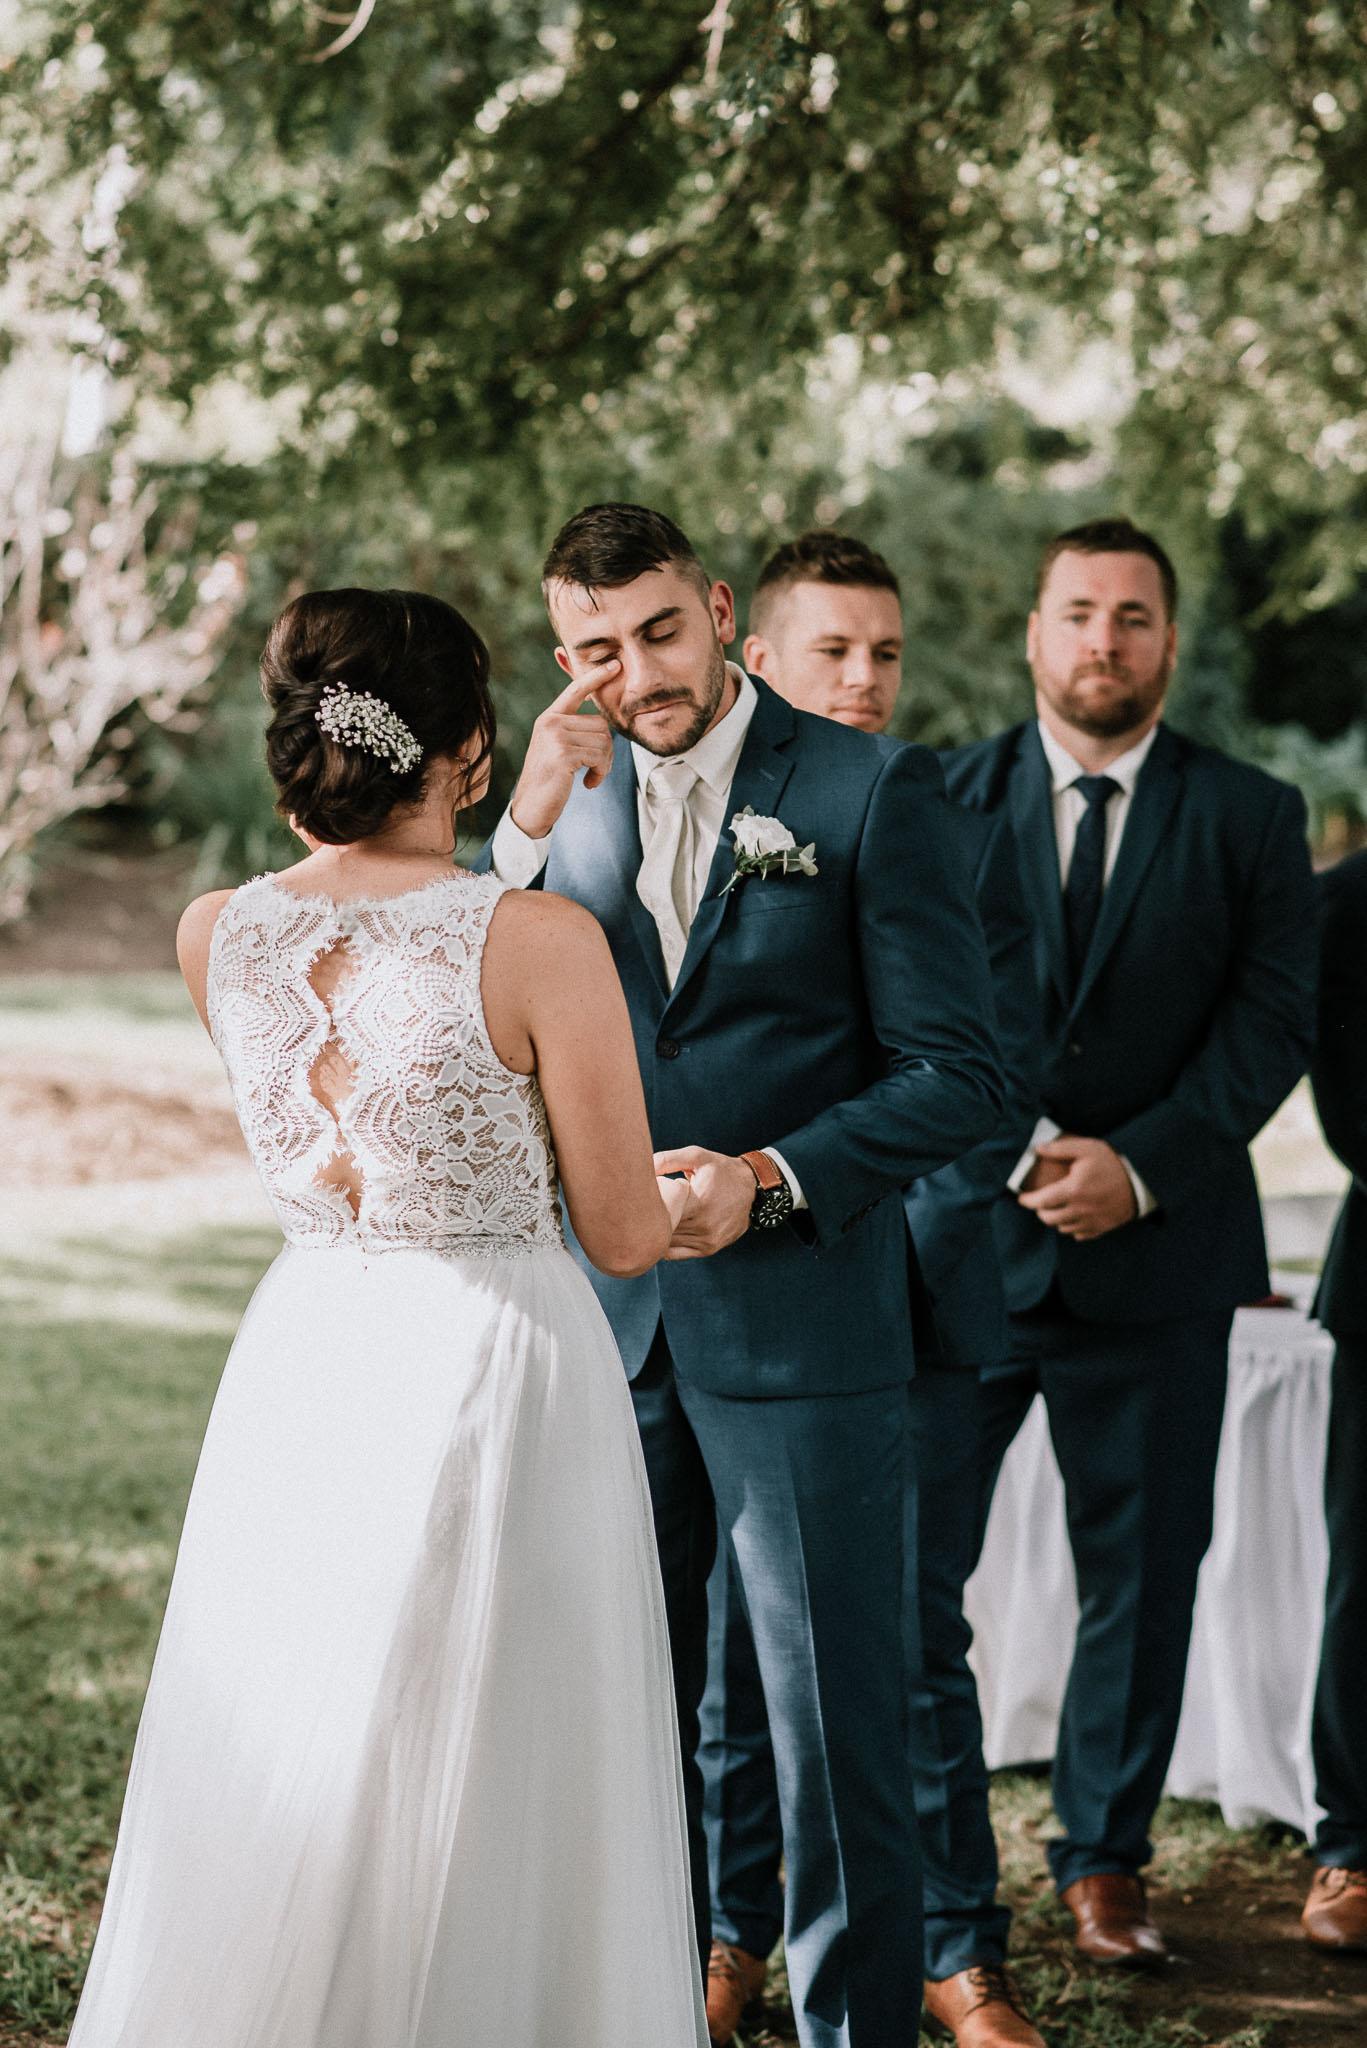 MECURE-RESORT-WEDDING-KING-WEB-50.jpg